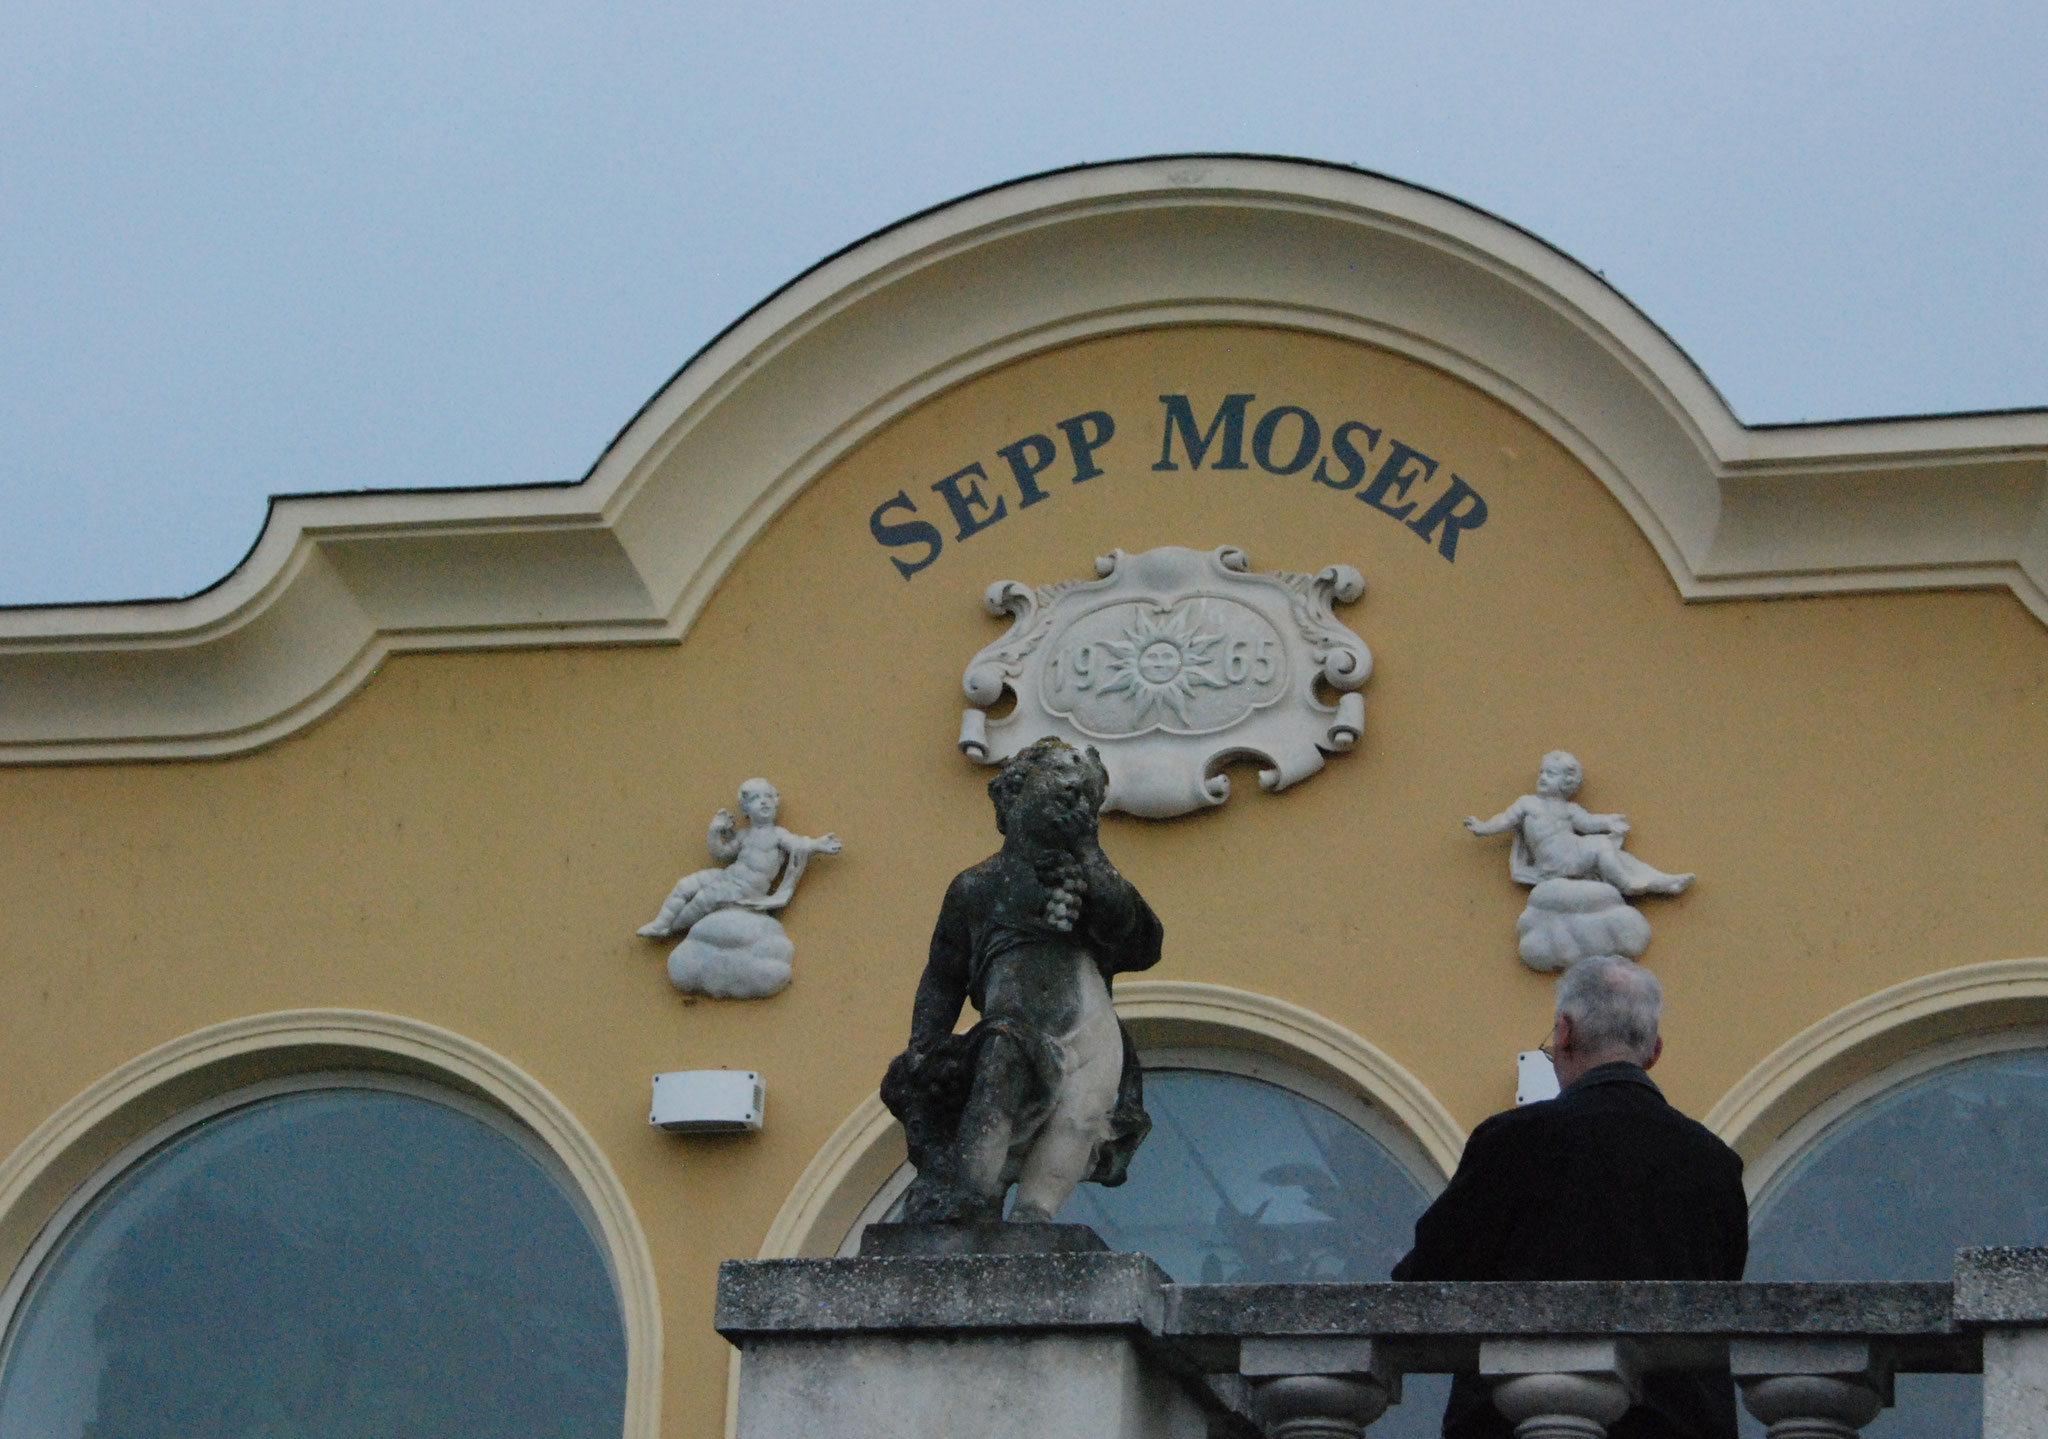 Beim Bio-Winzer Sepp Moser